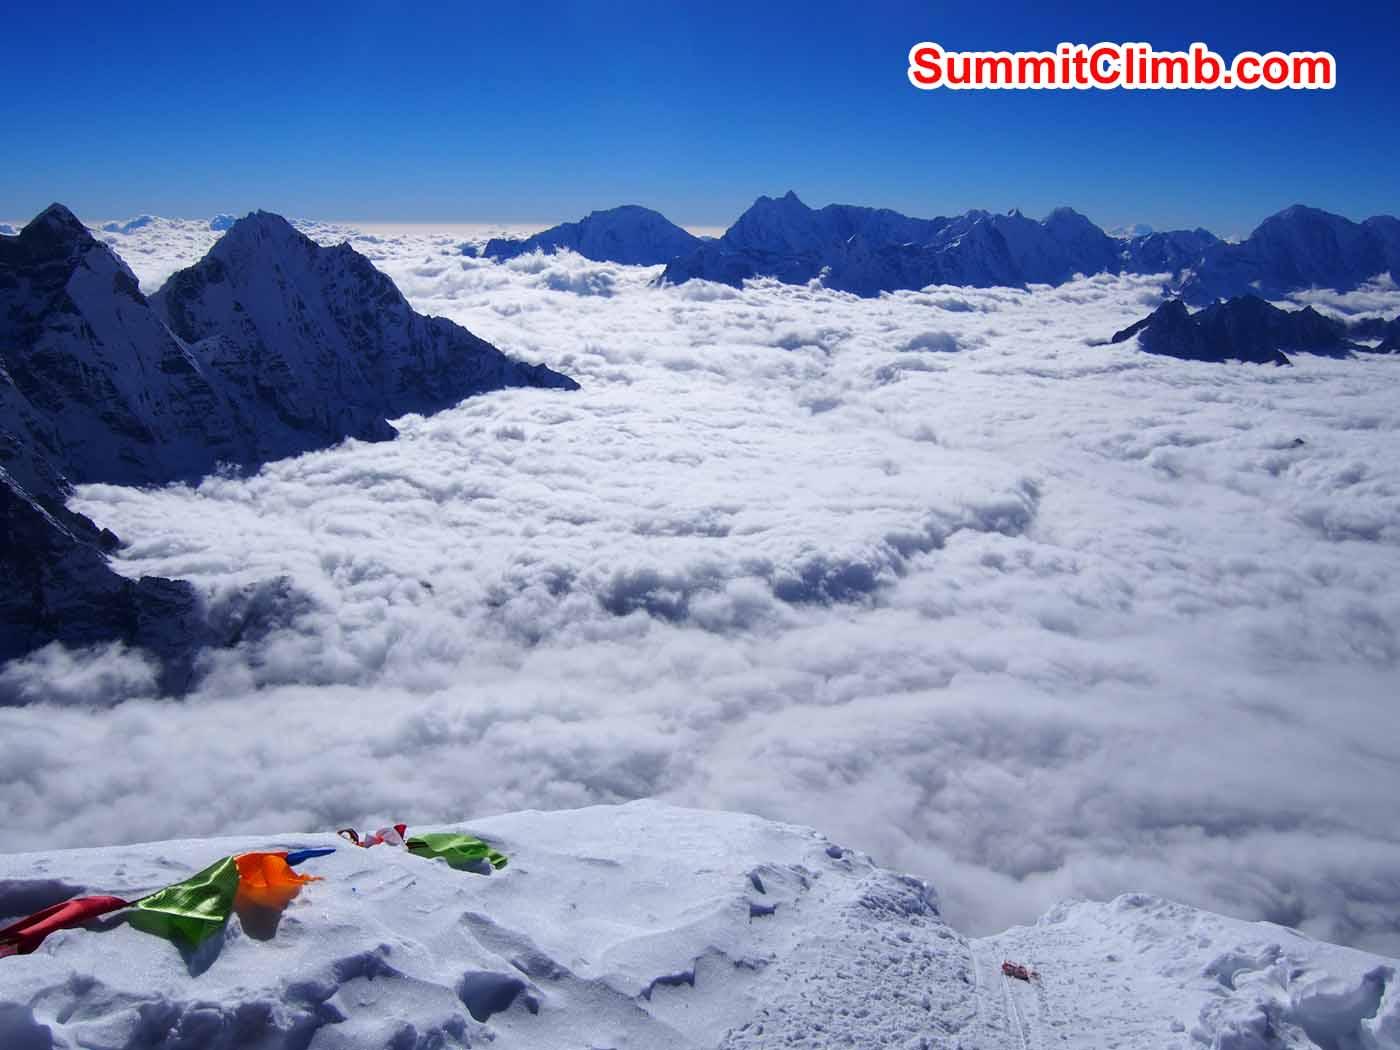 summitclimp photo